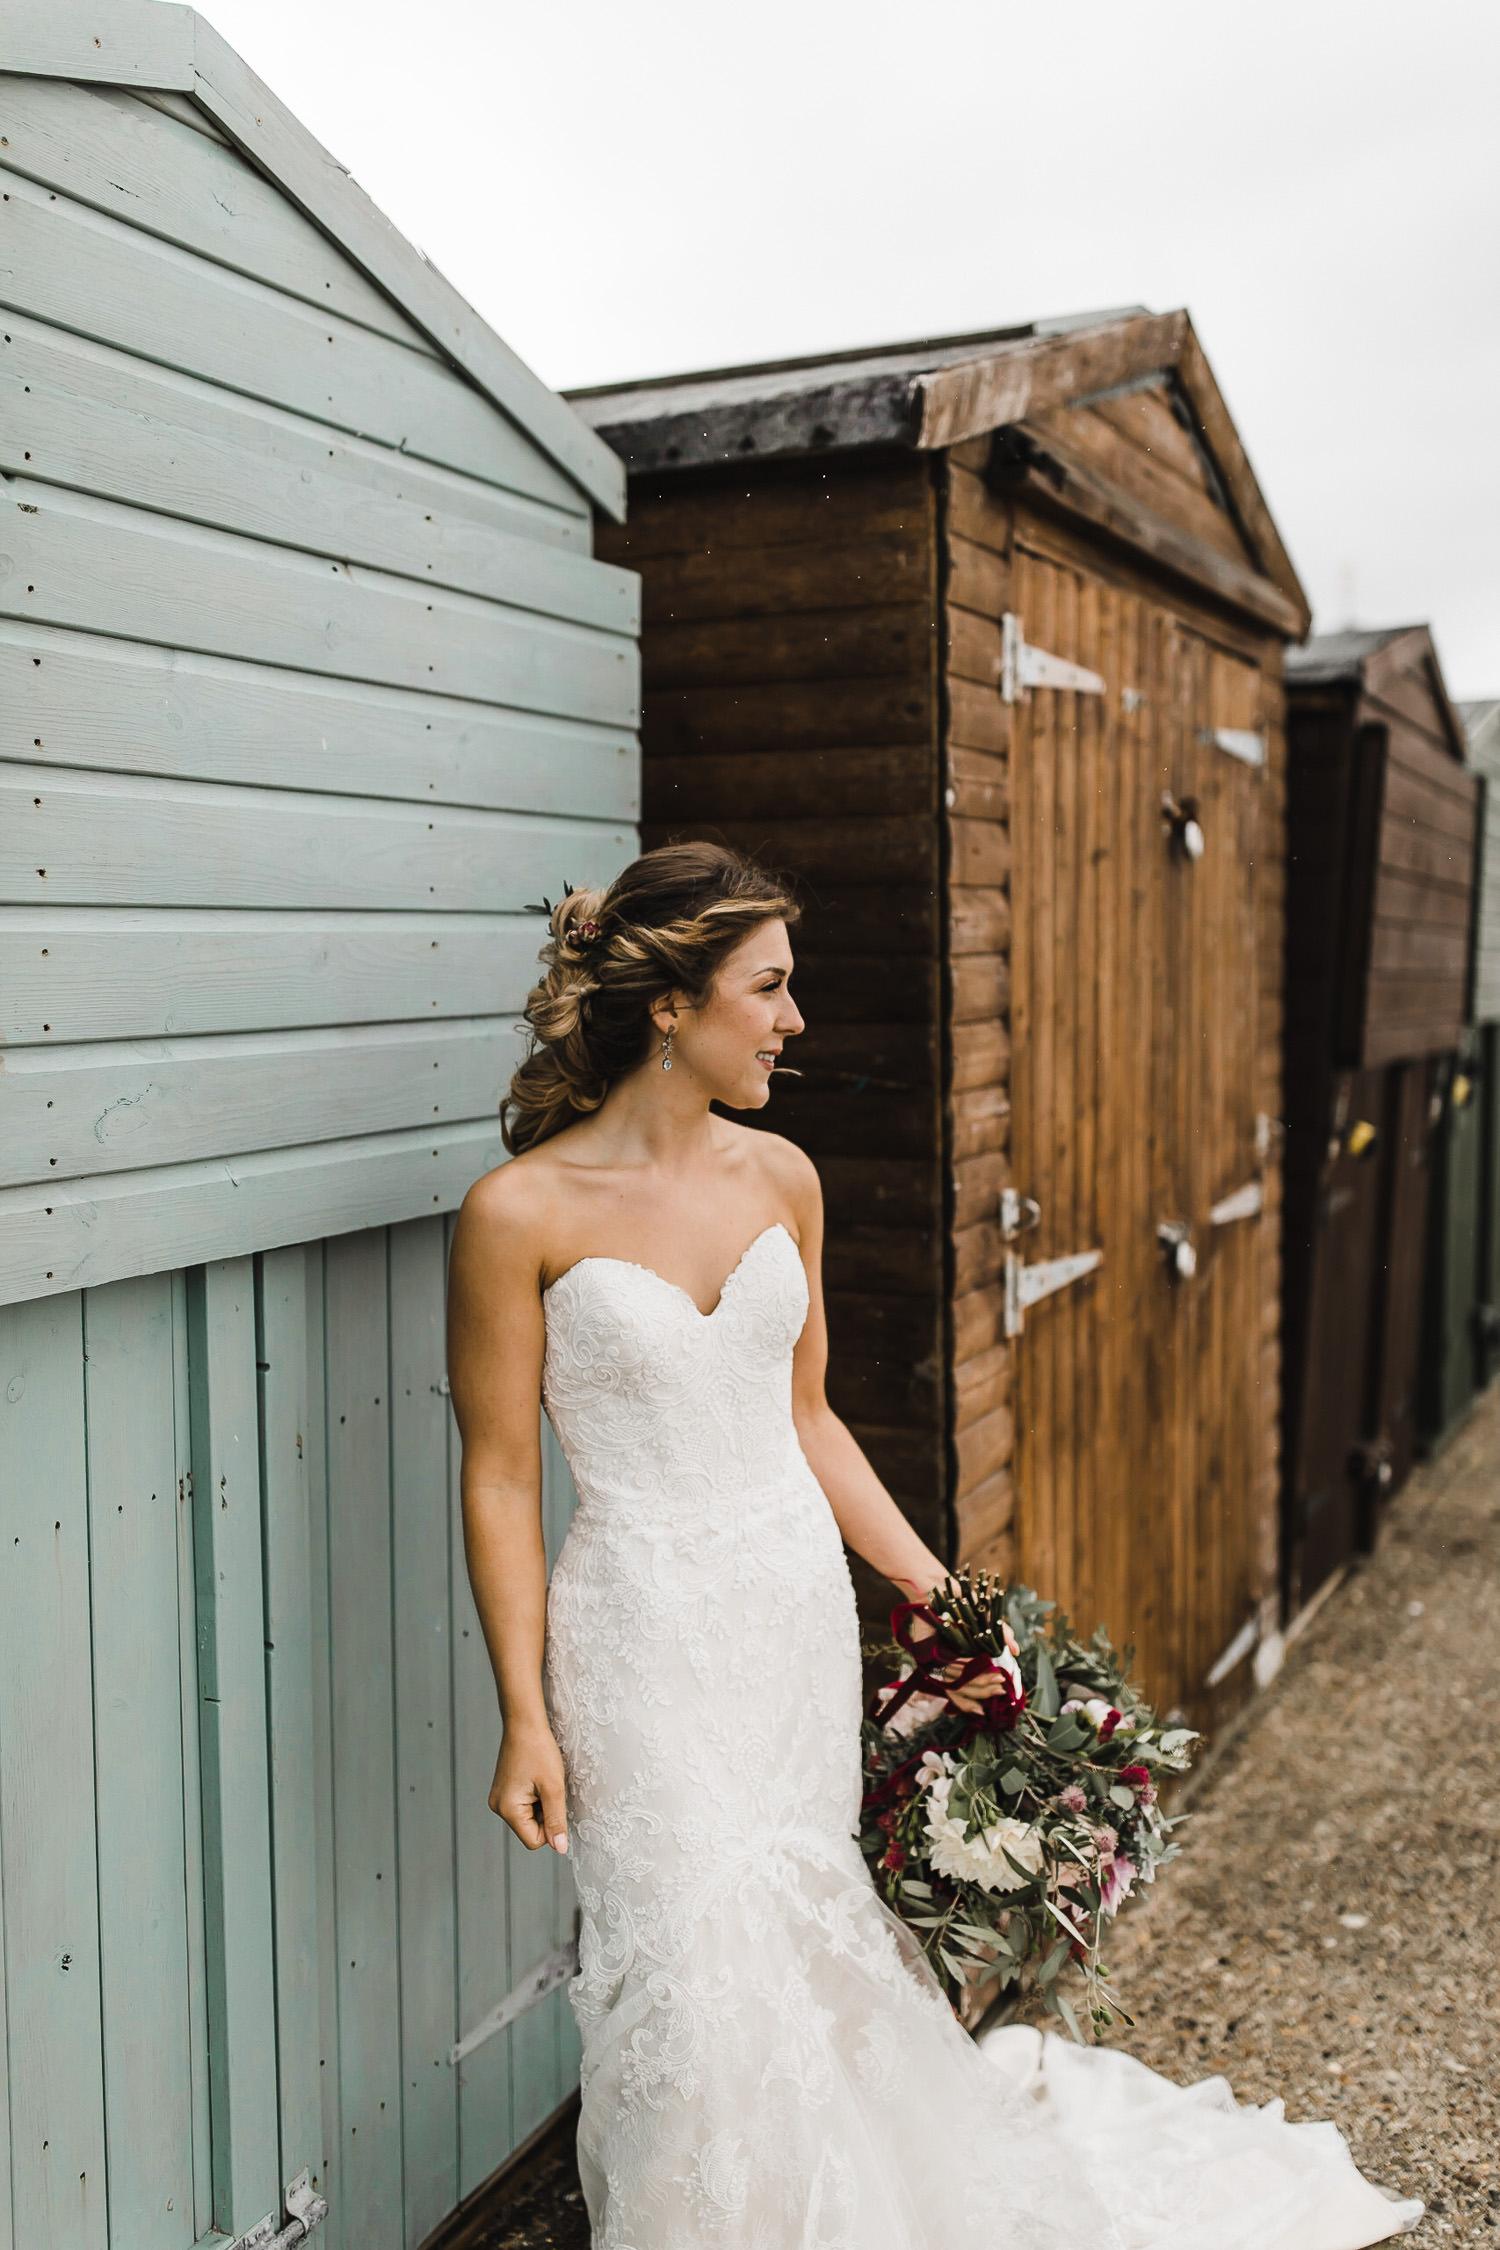 Margate_kent_seaside_fernery_greenhouse_wedding_0040.jpg